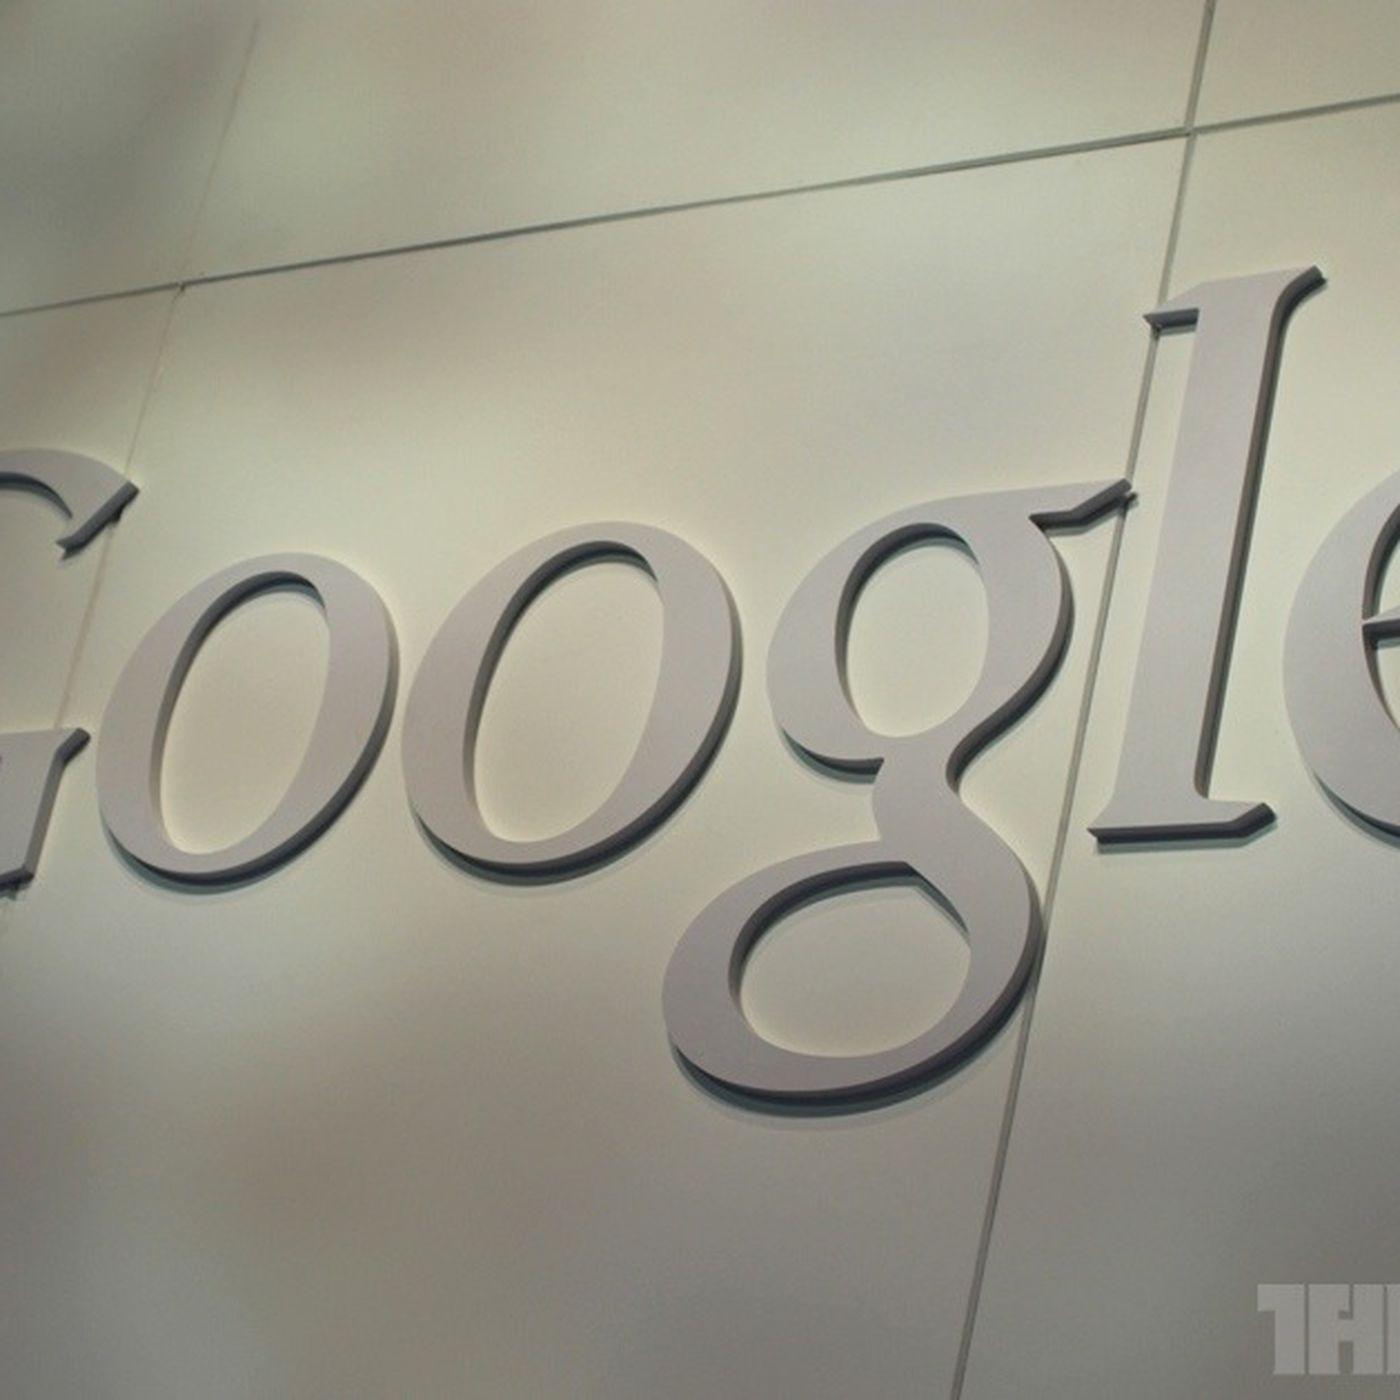 Google's Q2 2014 earnings deliver $15 96 billion in revenue